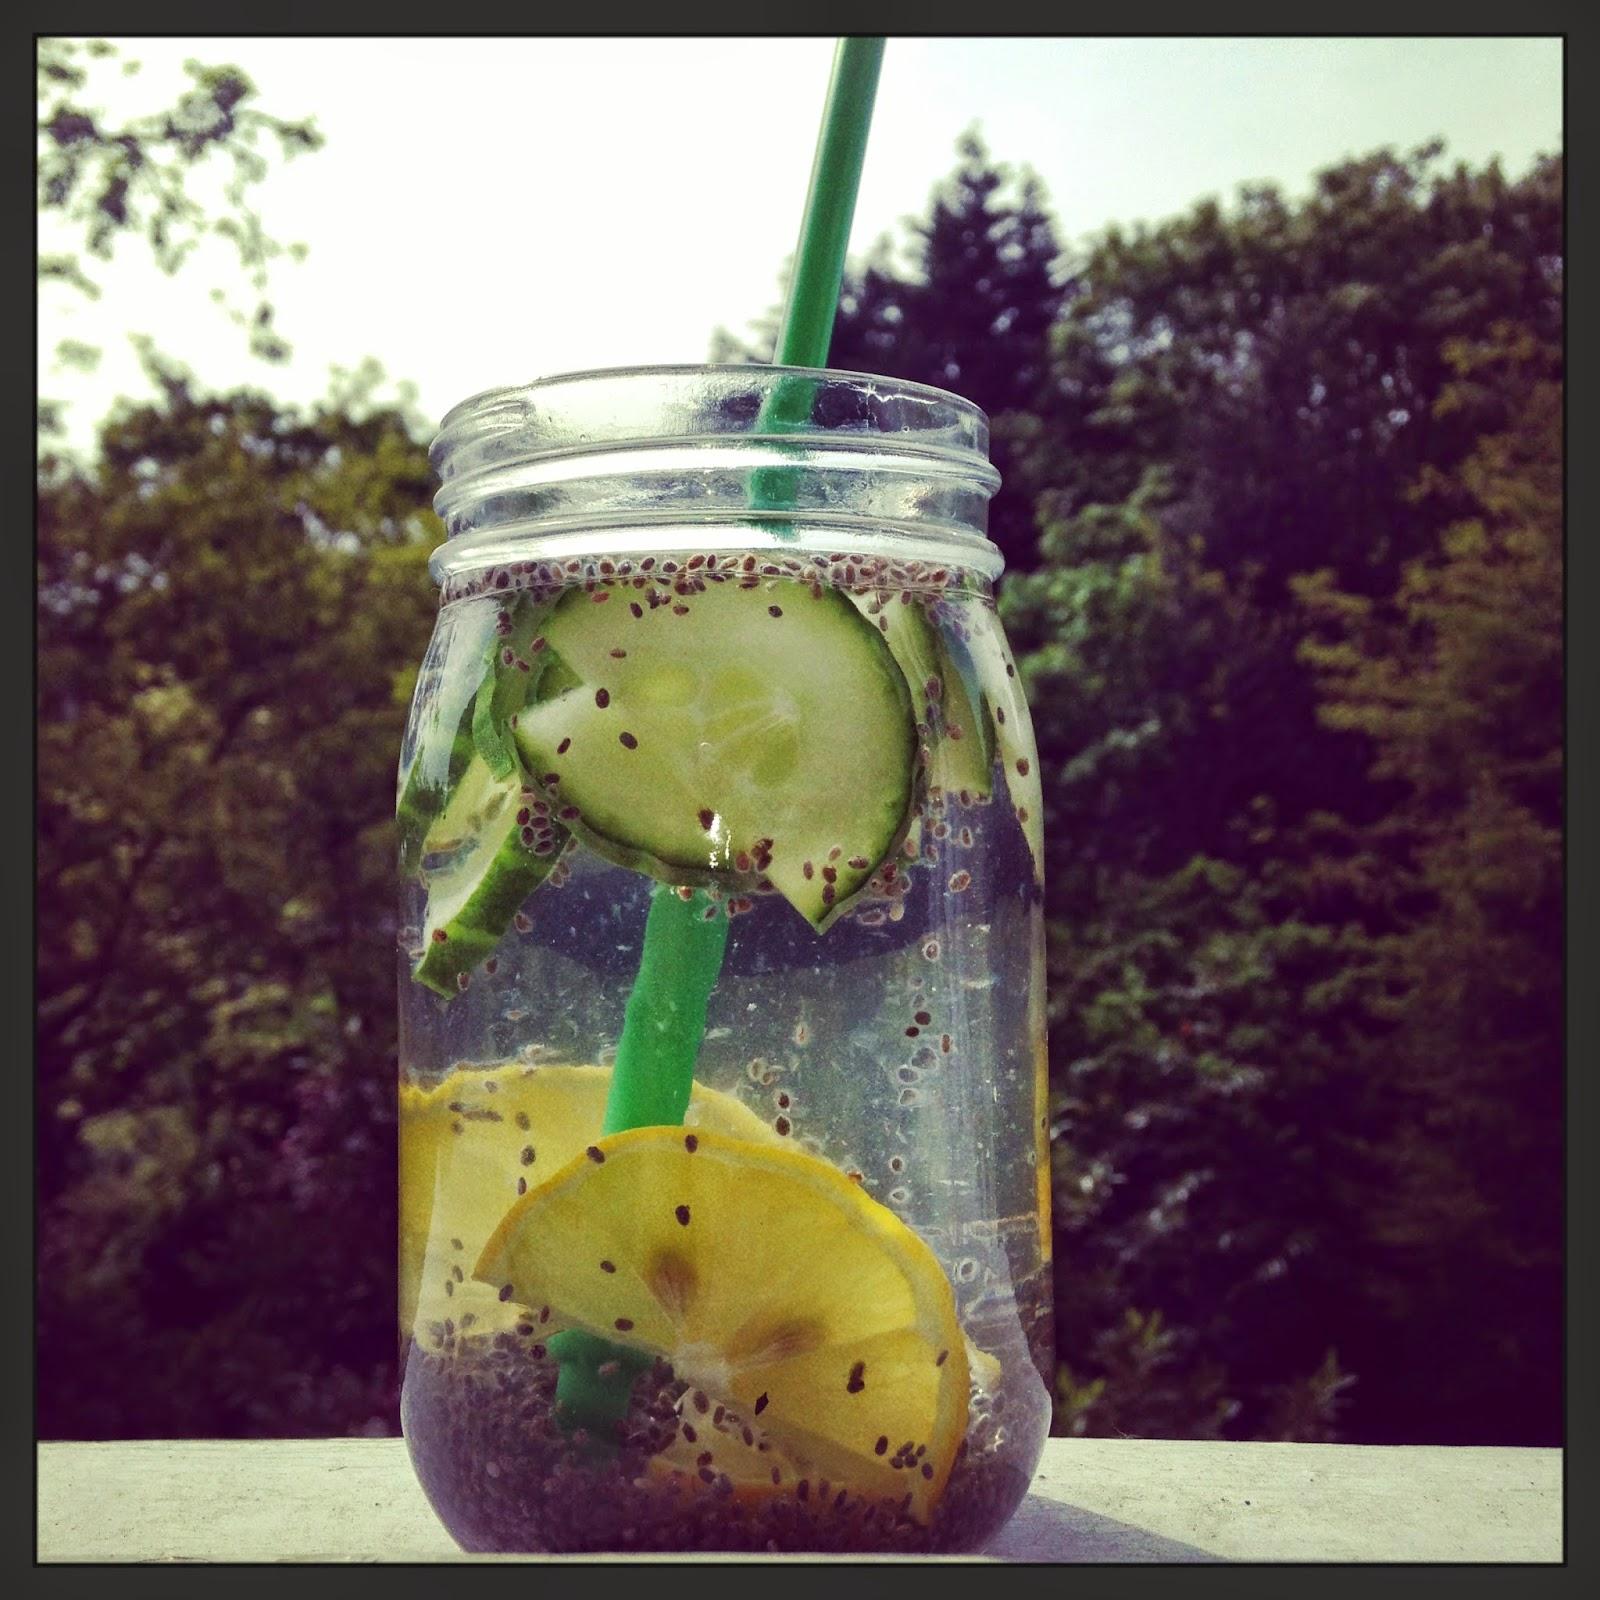 Lemon and cucumber chia fresca